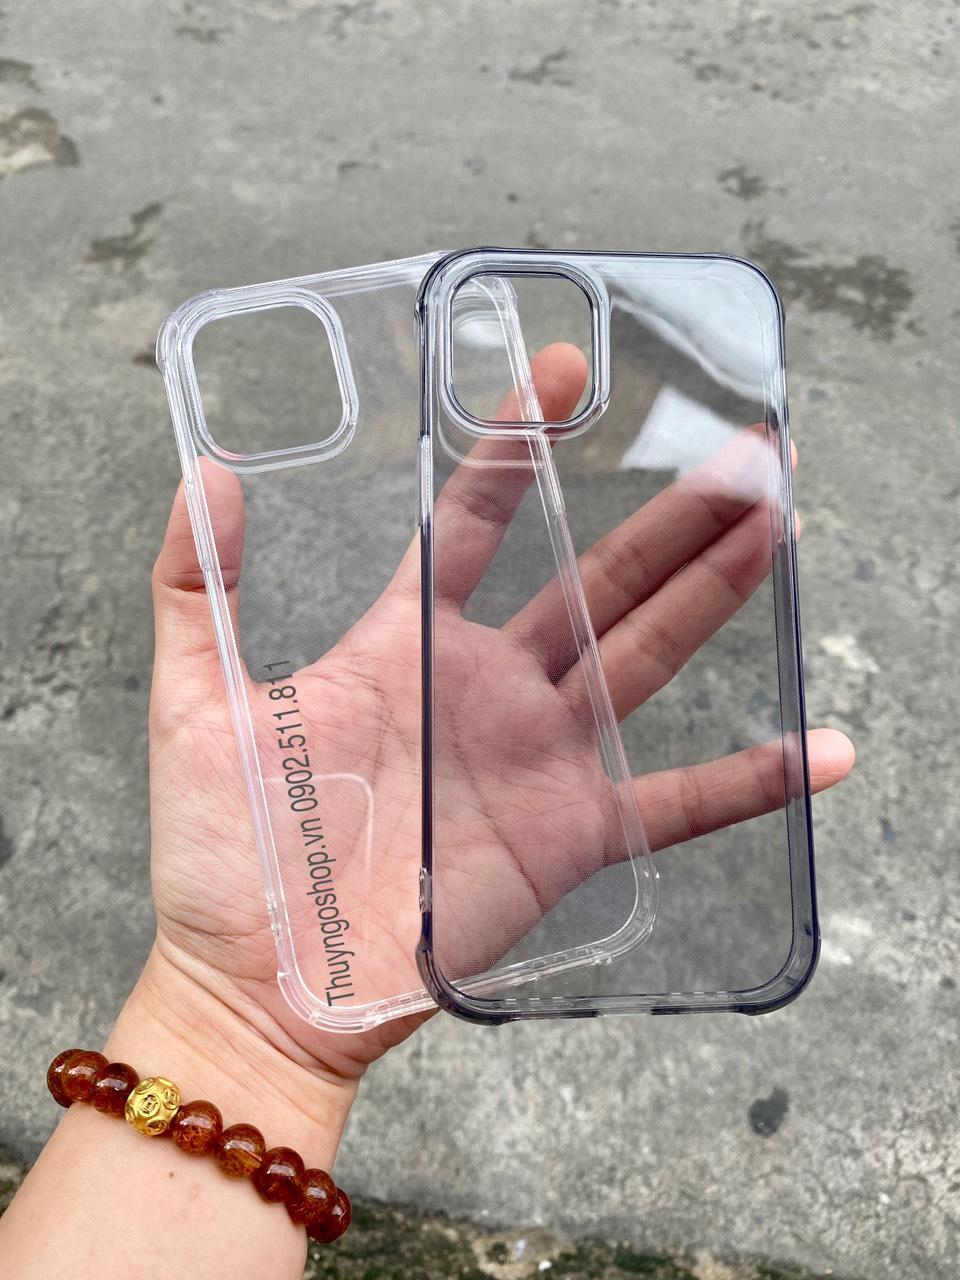 Ốp dẻo chống sốc LEEU - Iphone 12 mini / 12 / 12 pro / 12 pro max